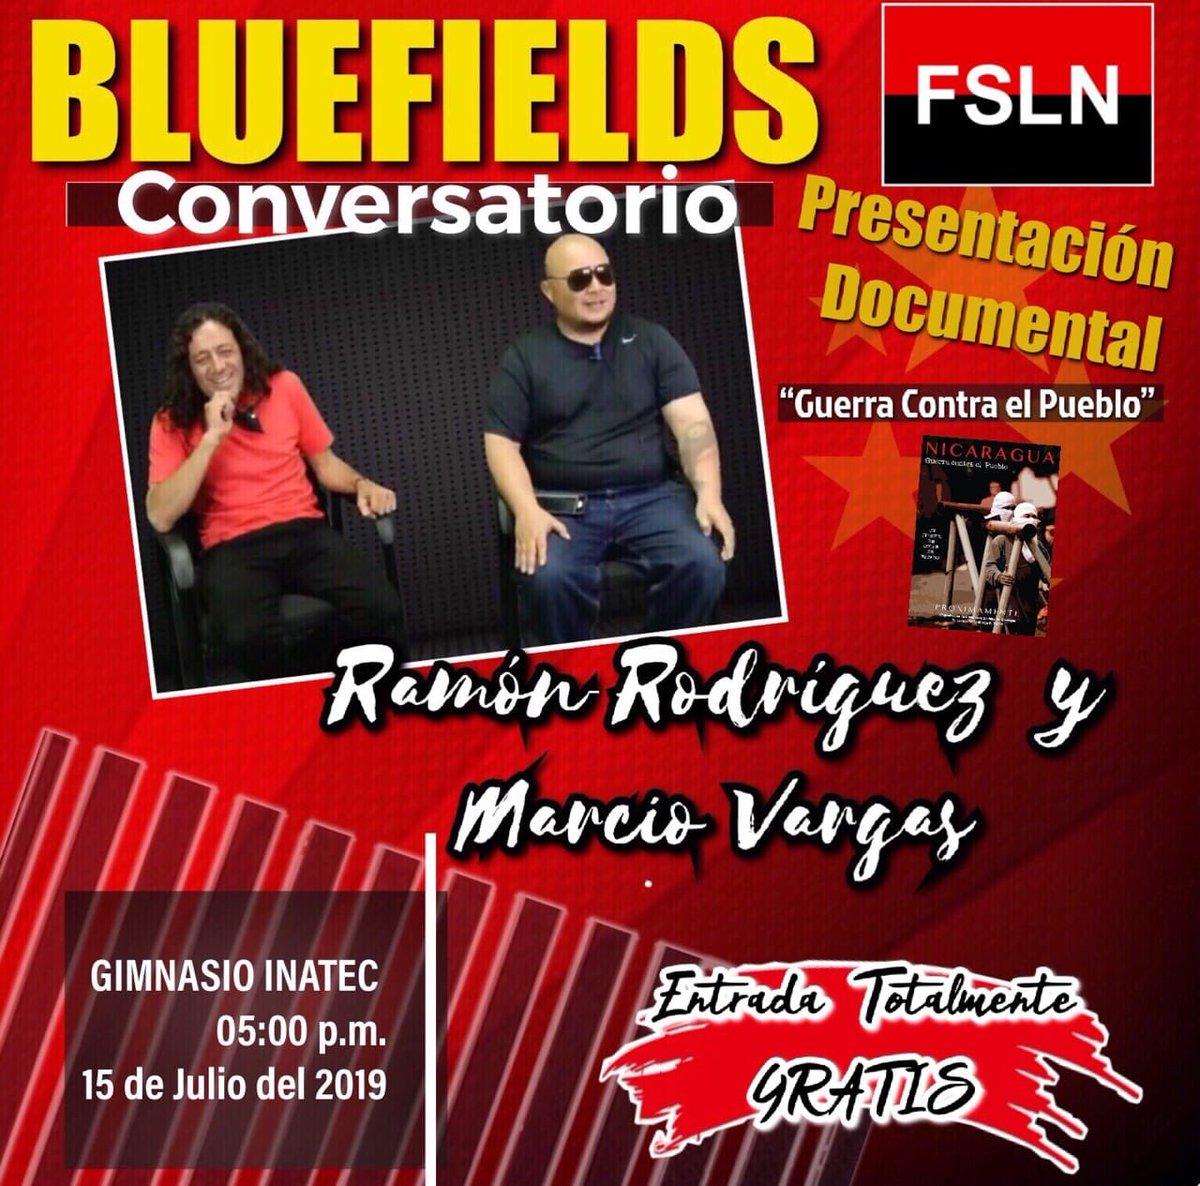 Hoy nos vemos en Bluefields. No Pudieron Ni Podrán. #PLOMO19 #Nicaragua40Revolución